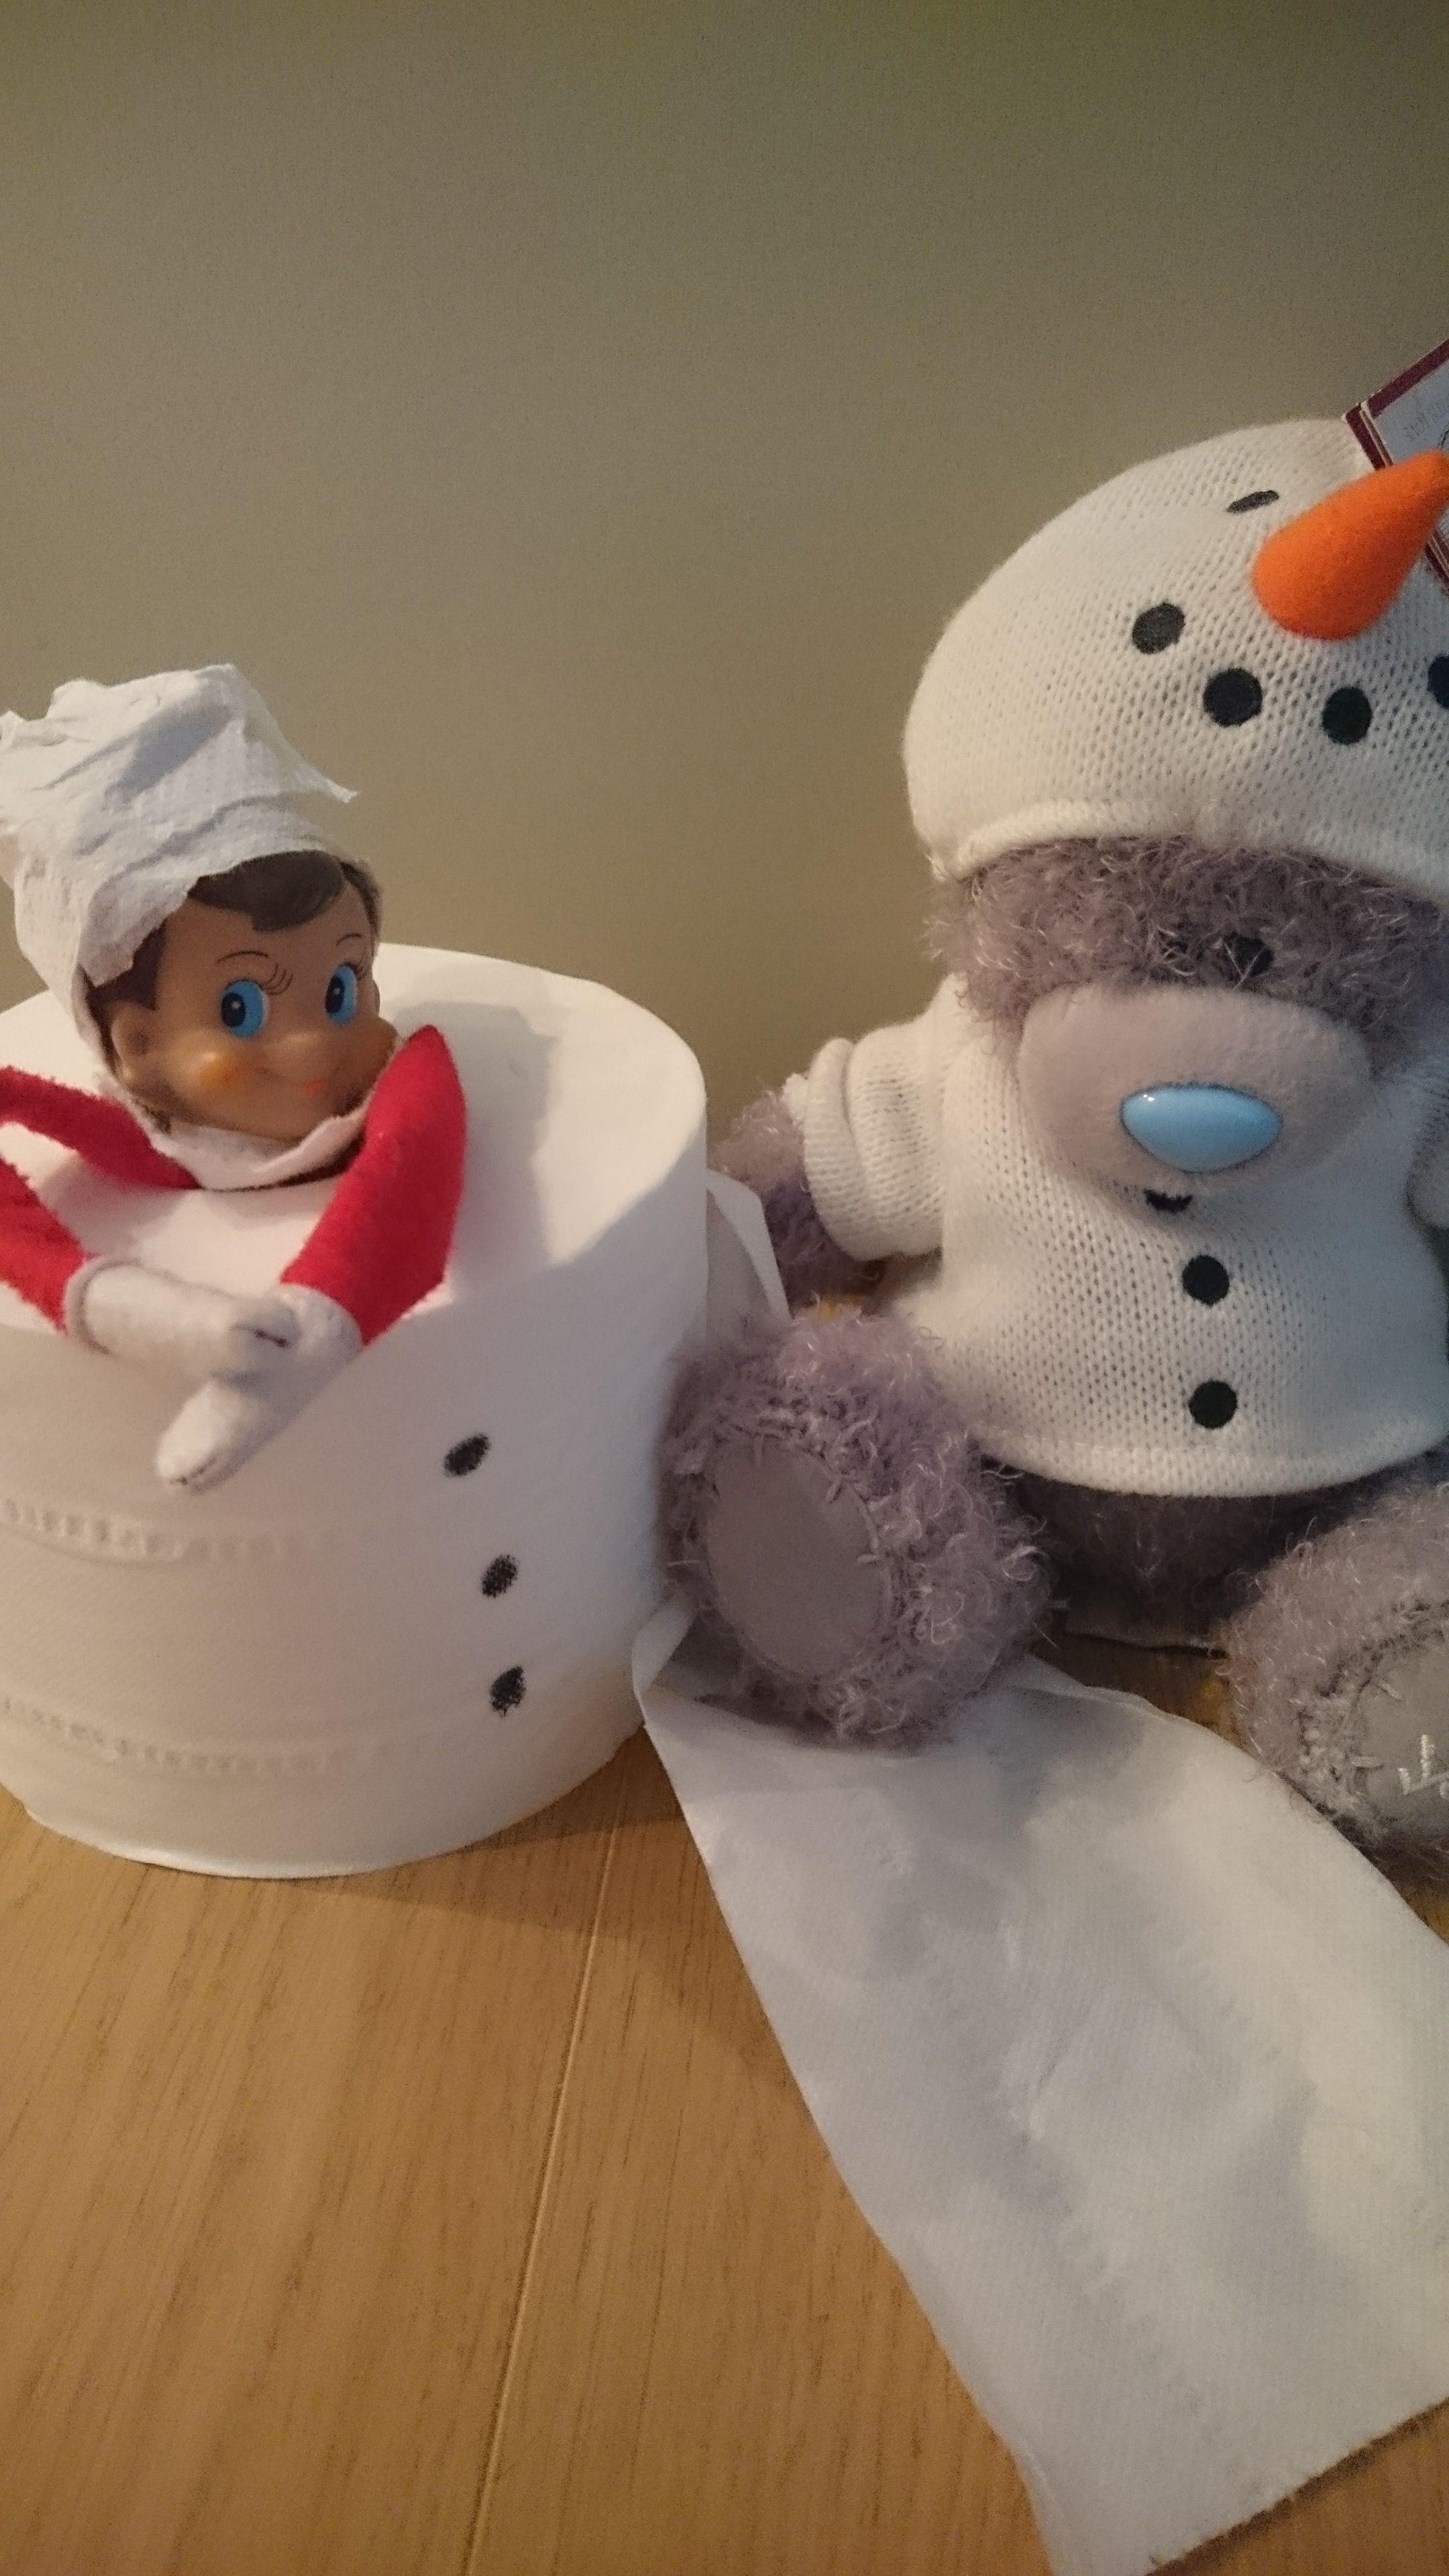 He's found a friend! #Snowman